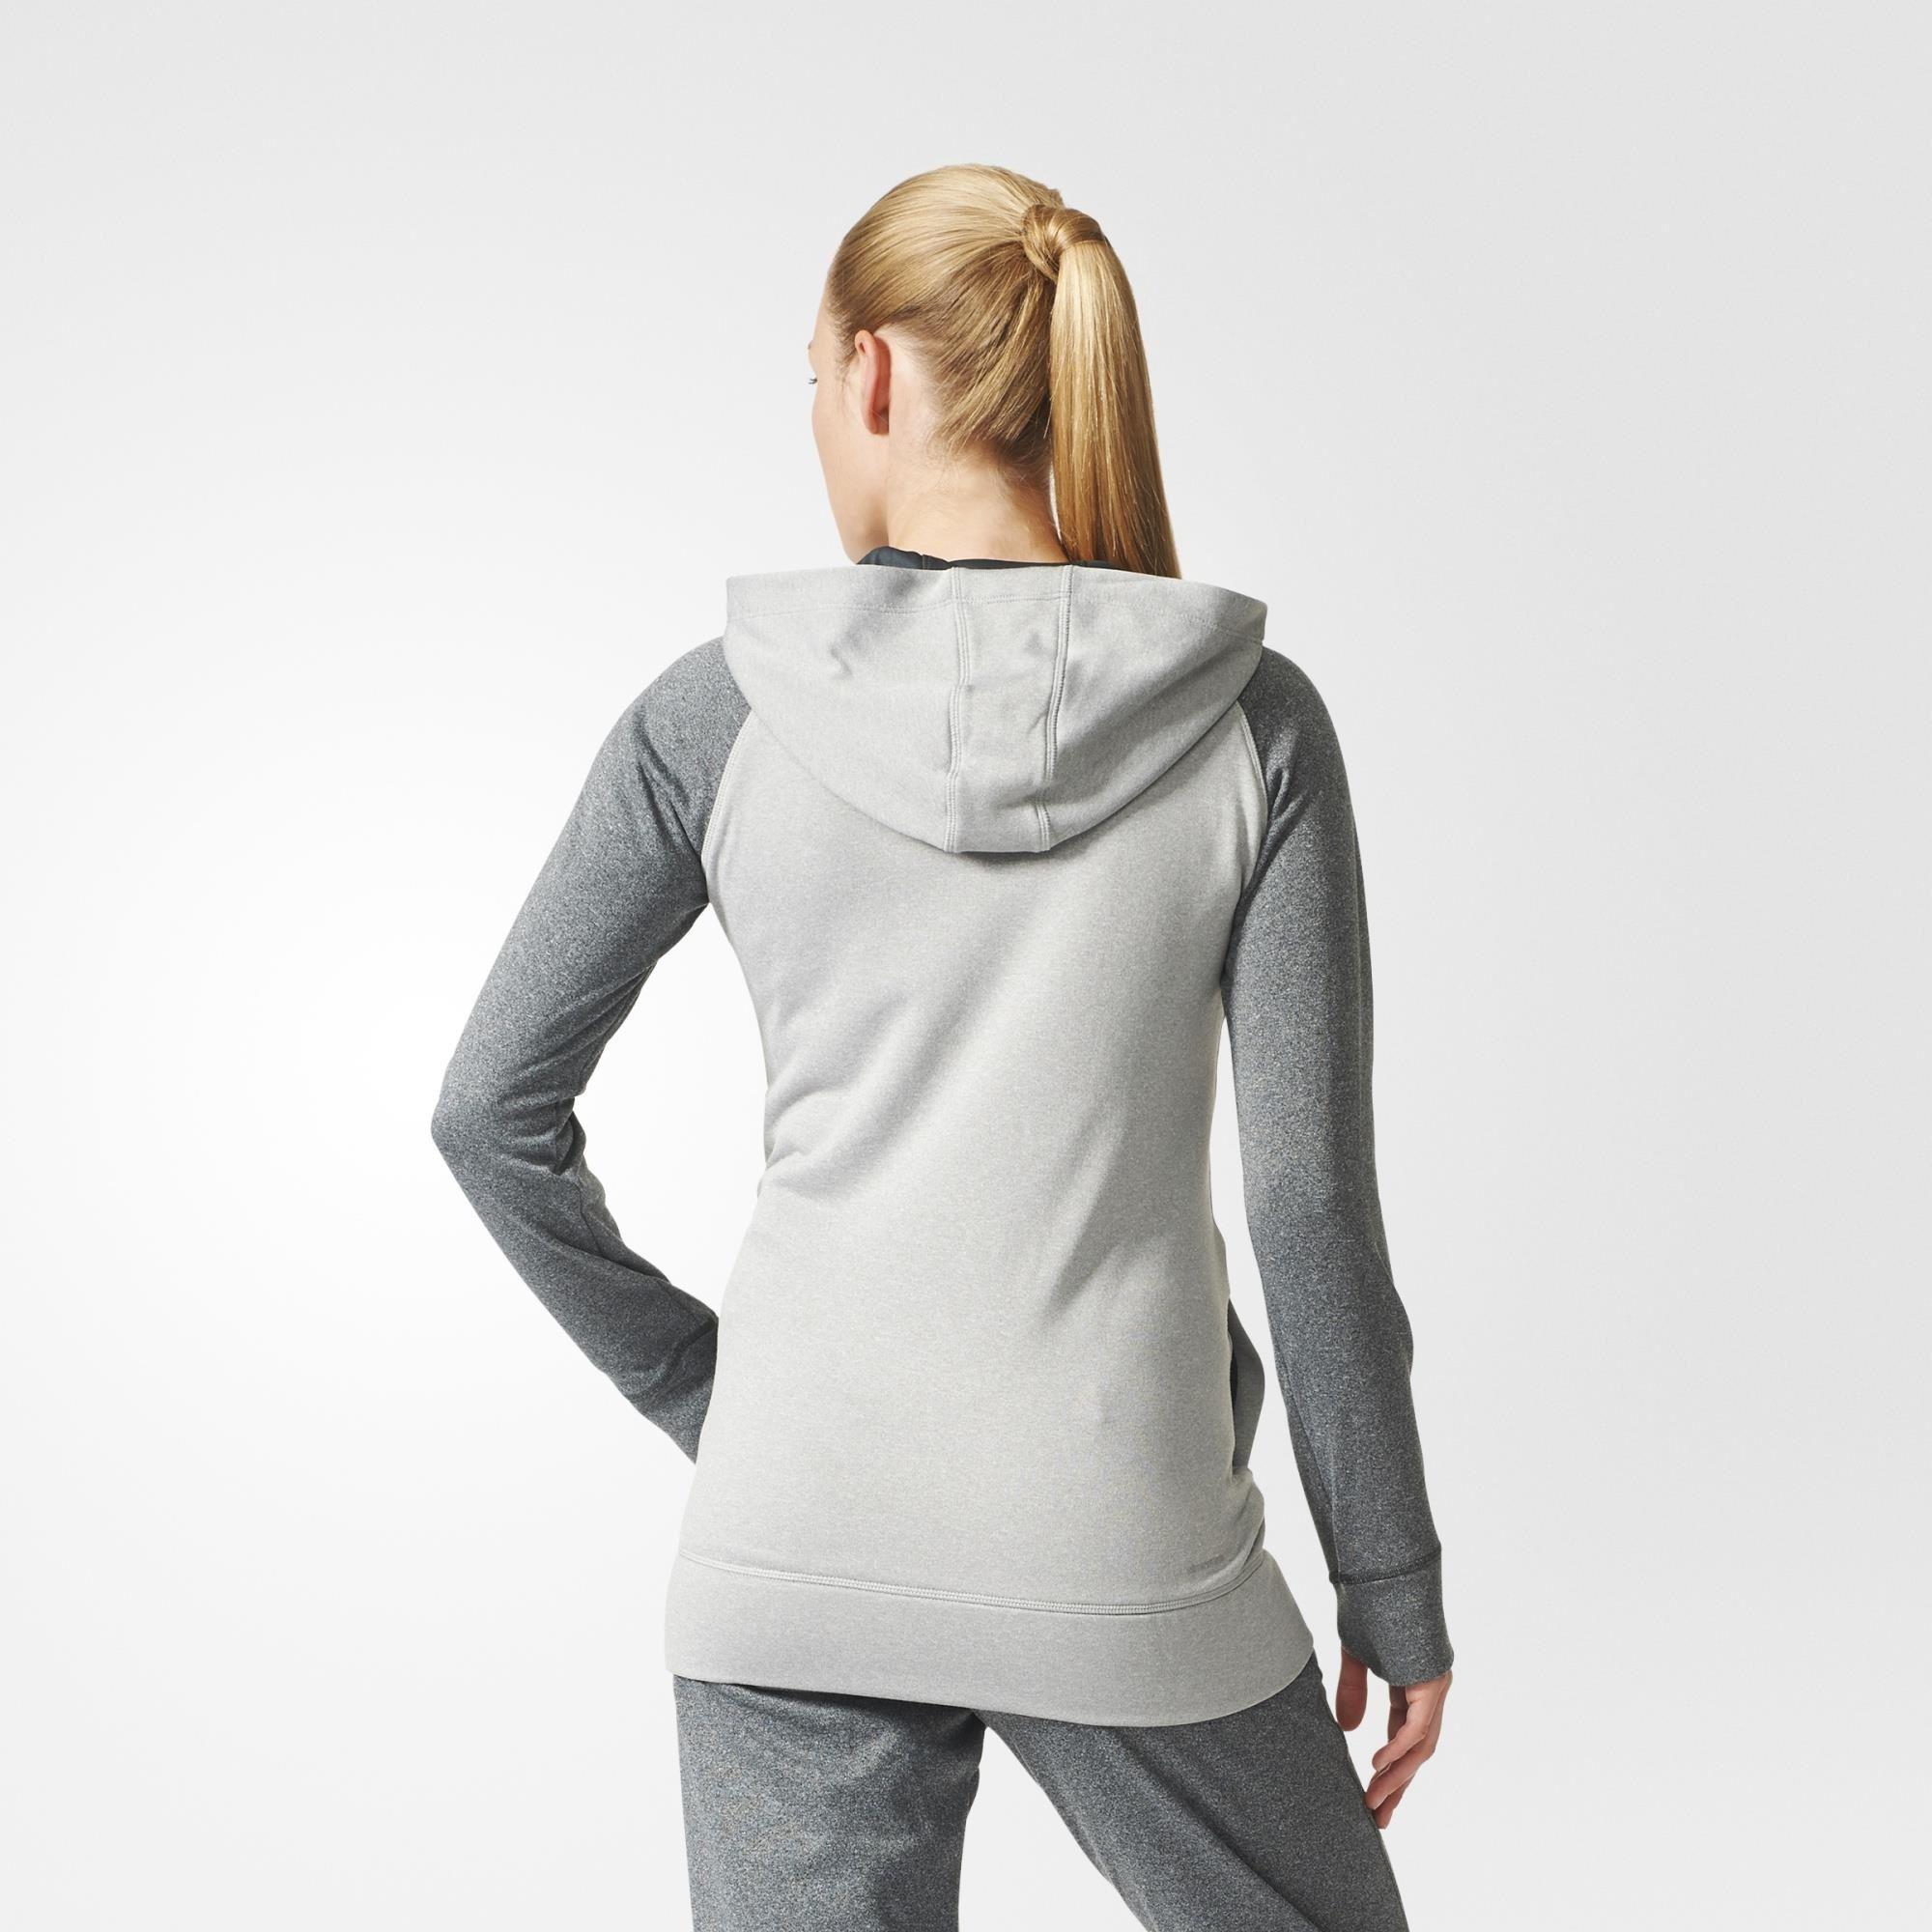 Adidas sudadera capucha Womens Ultimate polar sudadera con capucha gris gris 064c388 - colja.host